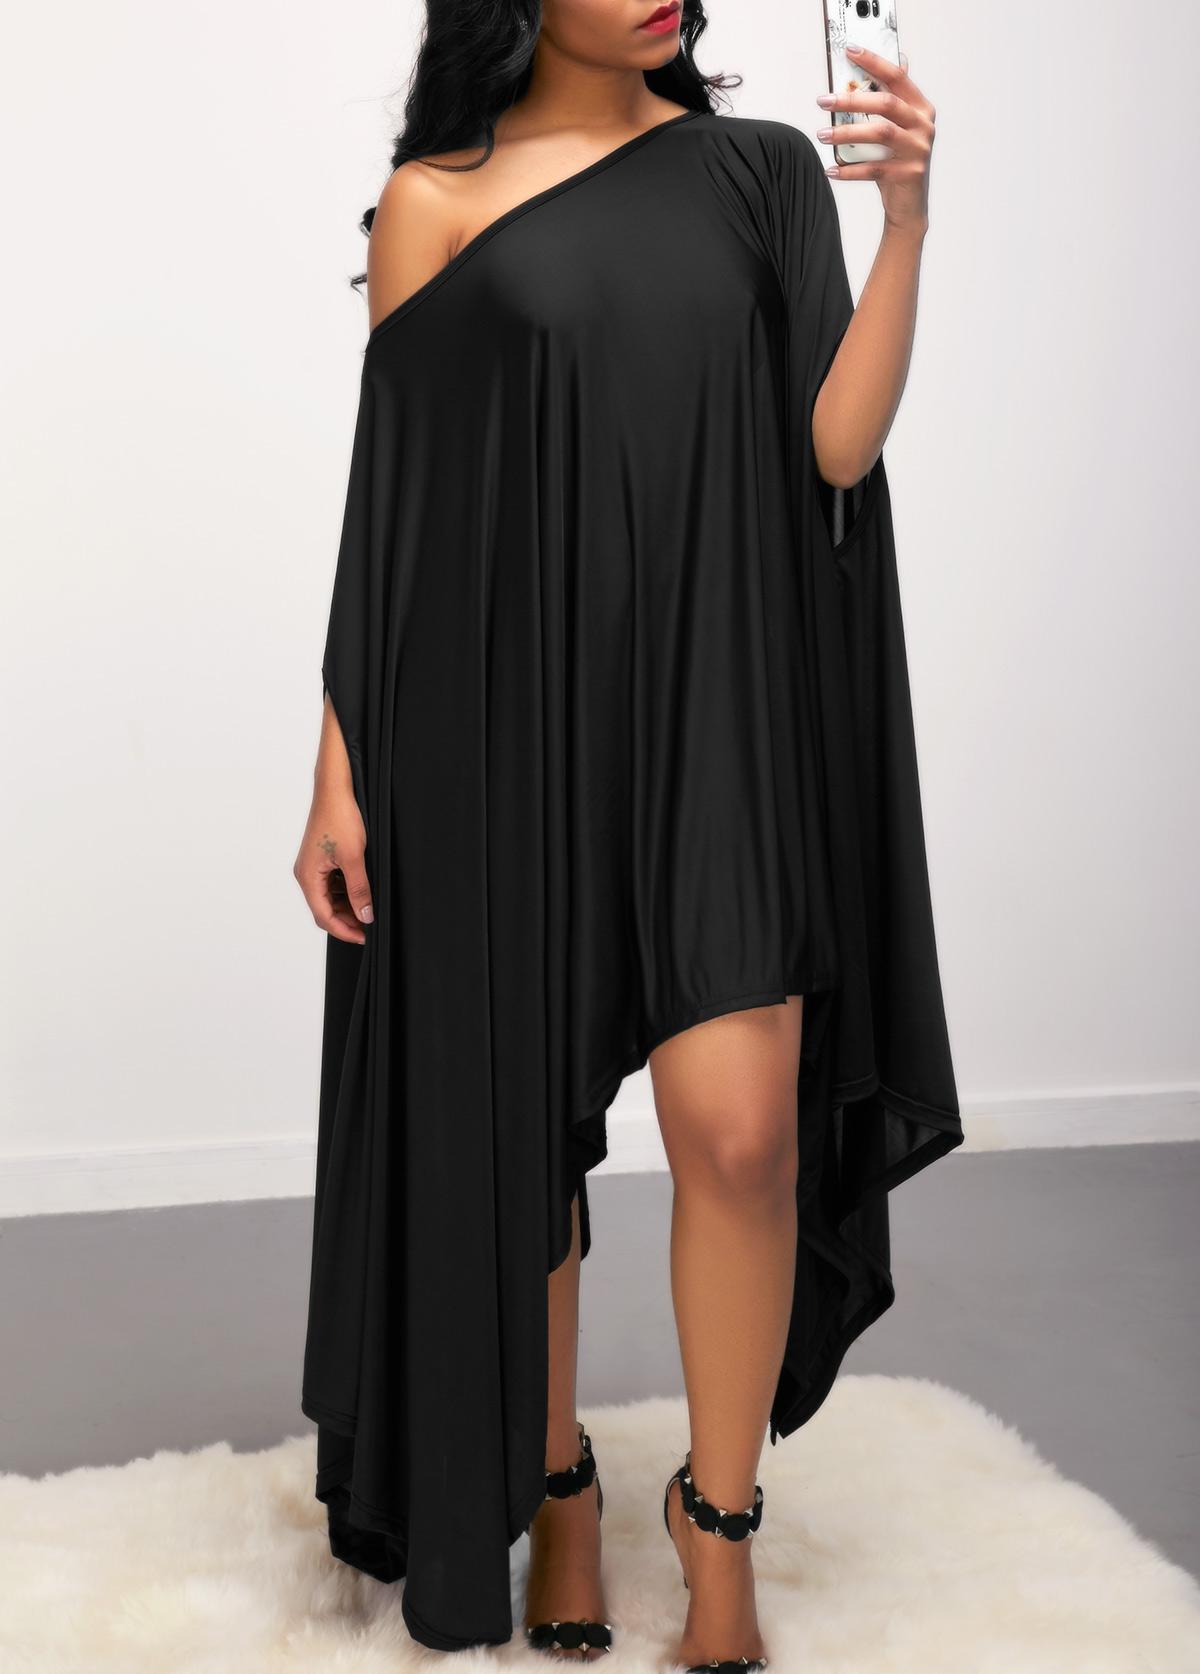 Black Skew Neck Batwing Sleeve Asymmetric Hem Dress